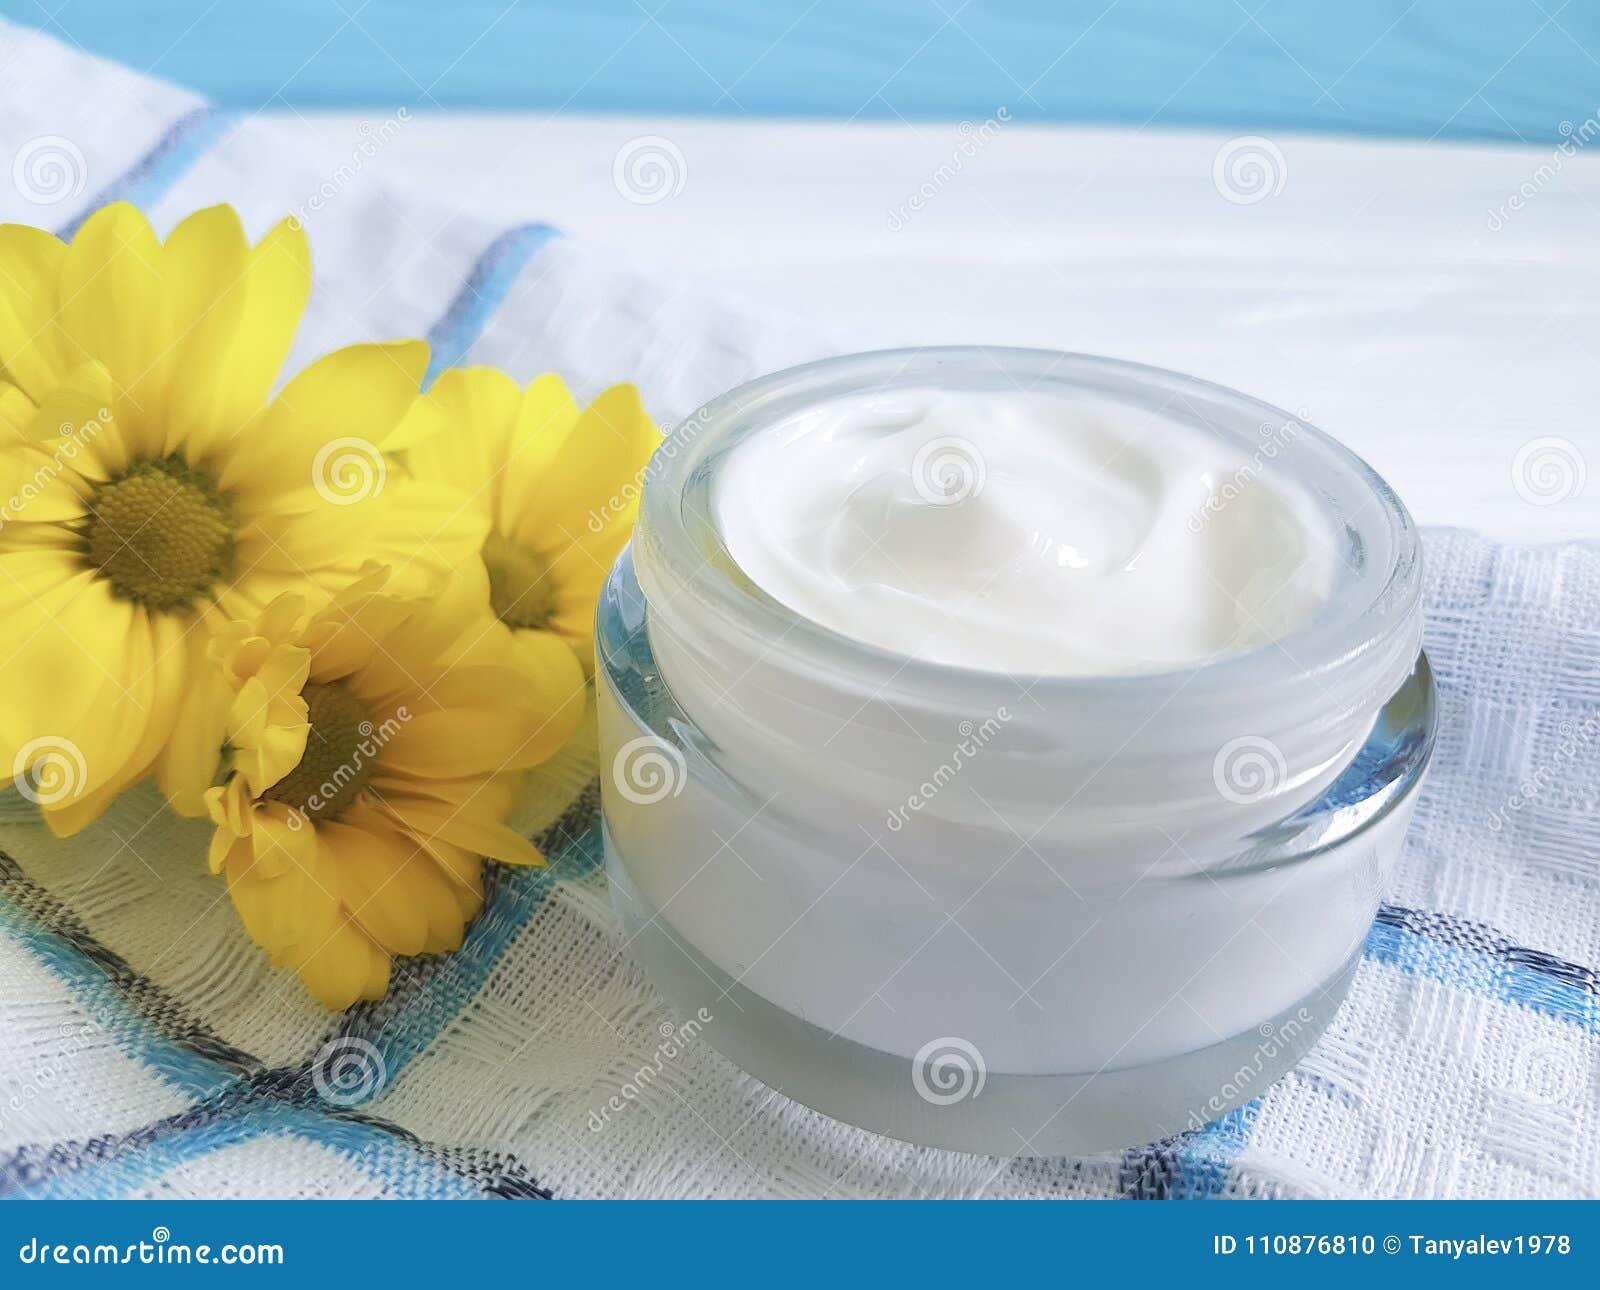 Cosmetic Cream Organic Morning Skincare Ointment Yellow